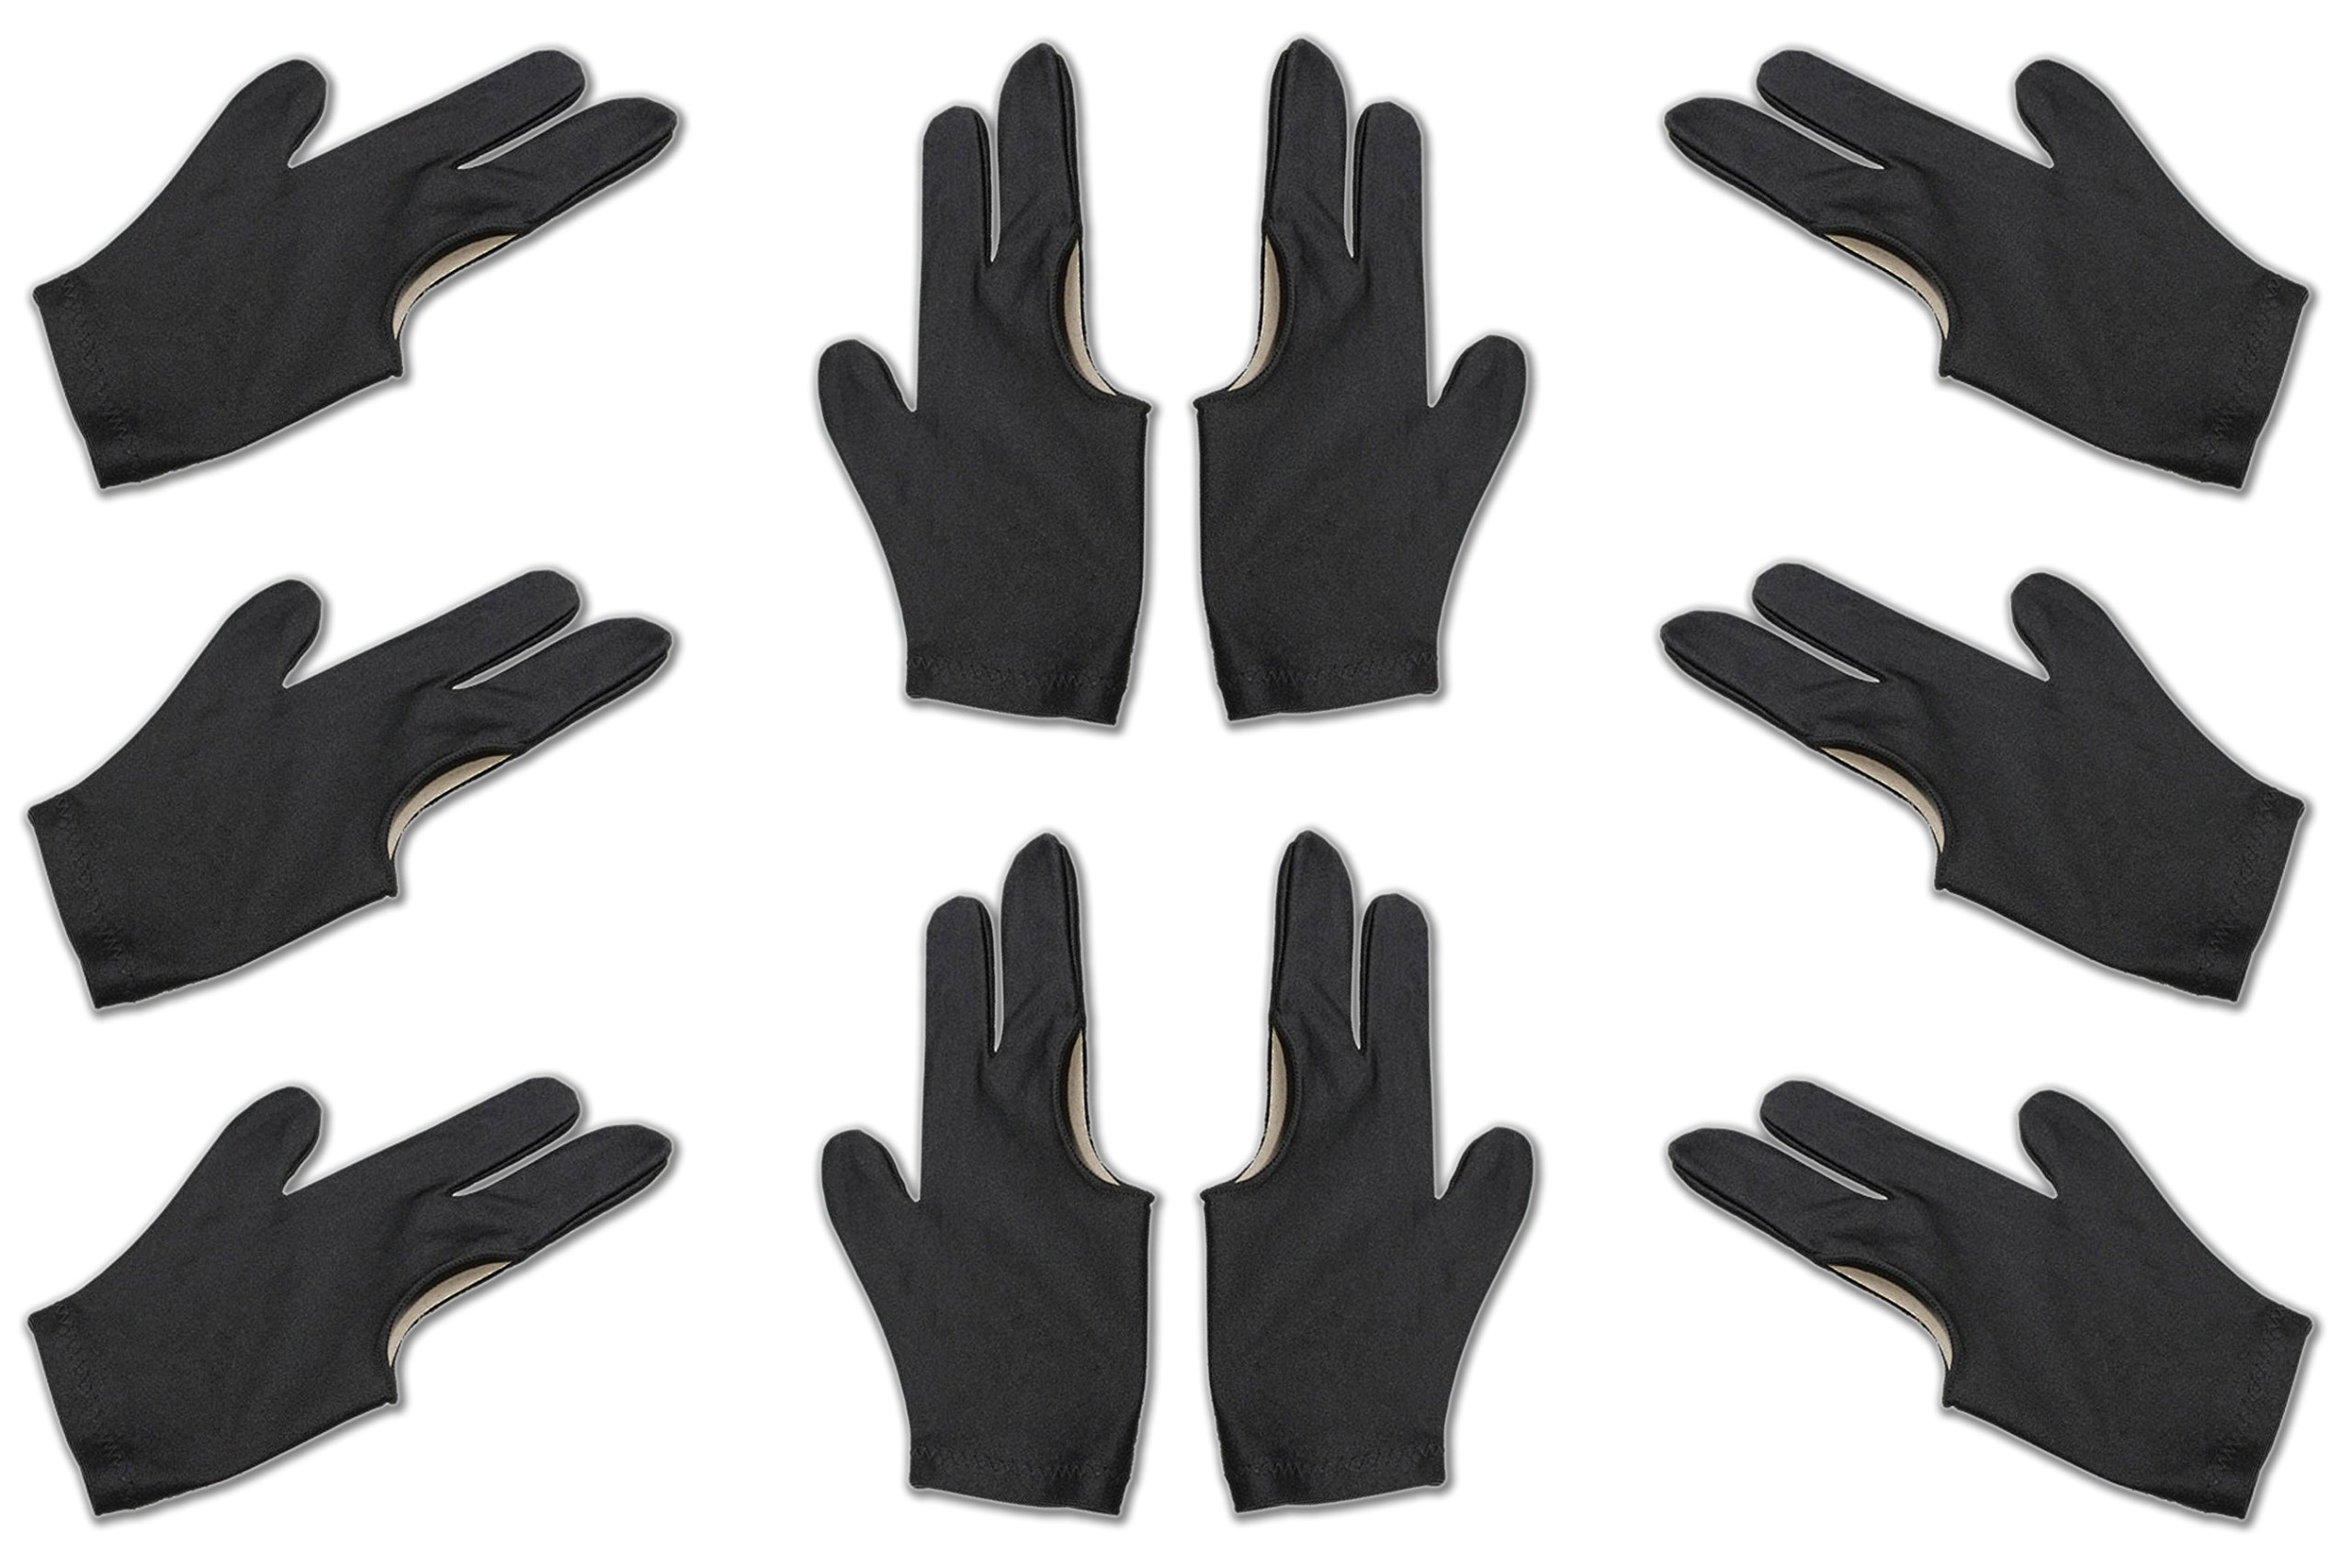 Billiard Depot 10pcs/set 3 Finger Billiard Gloves Pool Cue Gloves